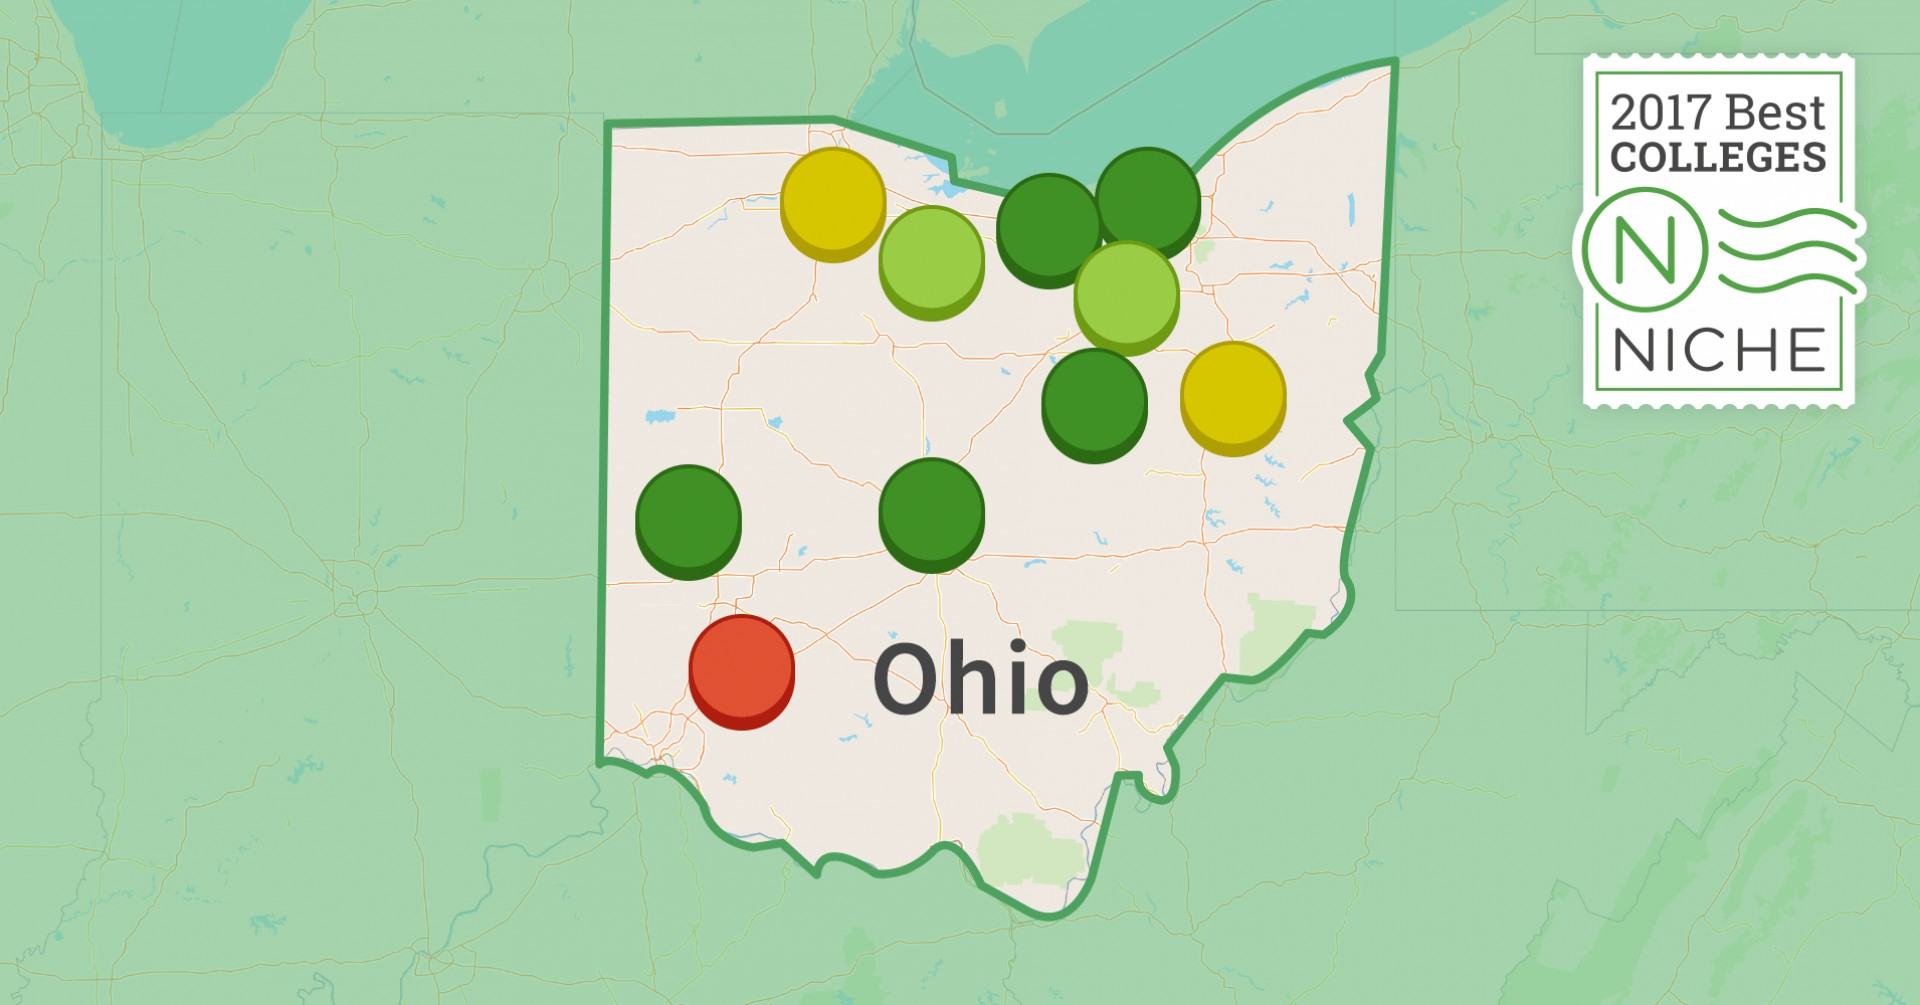 015 Colleges Best In Ohio 1910px Essay Example Niche No Marvelous Scholarship Reddit Winners 1920